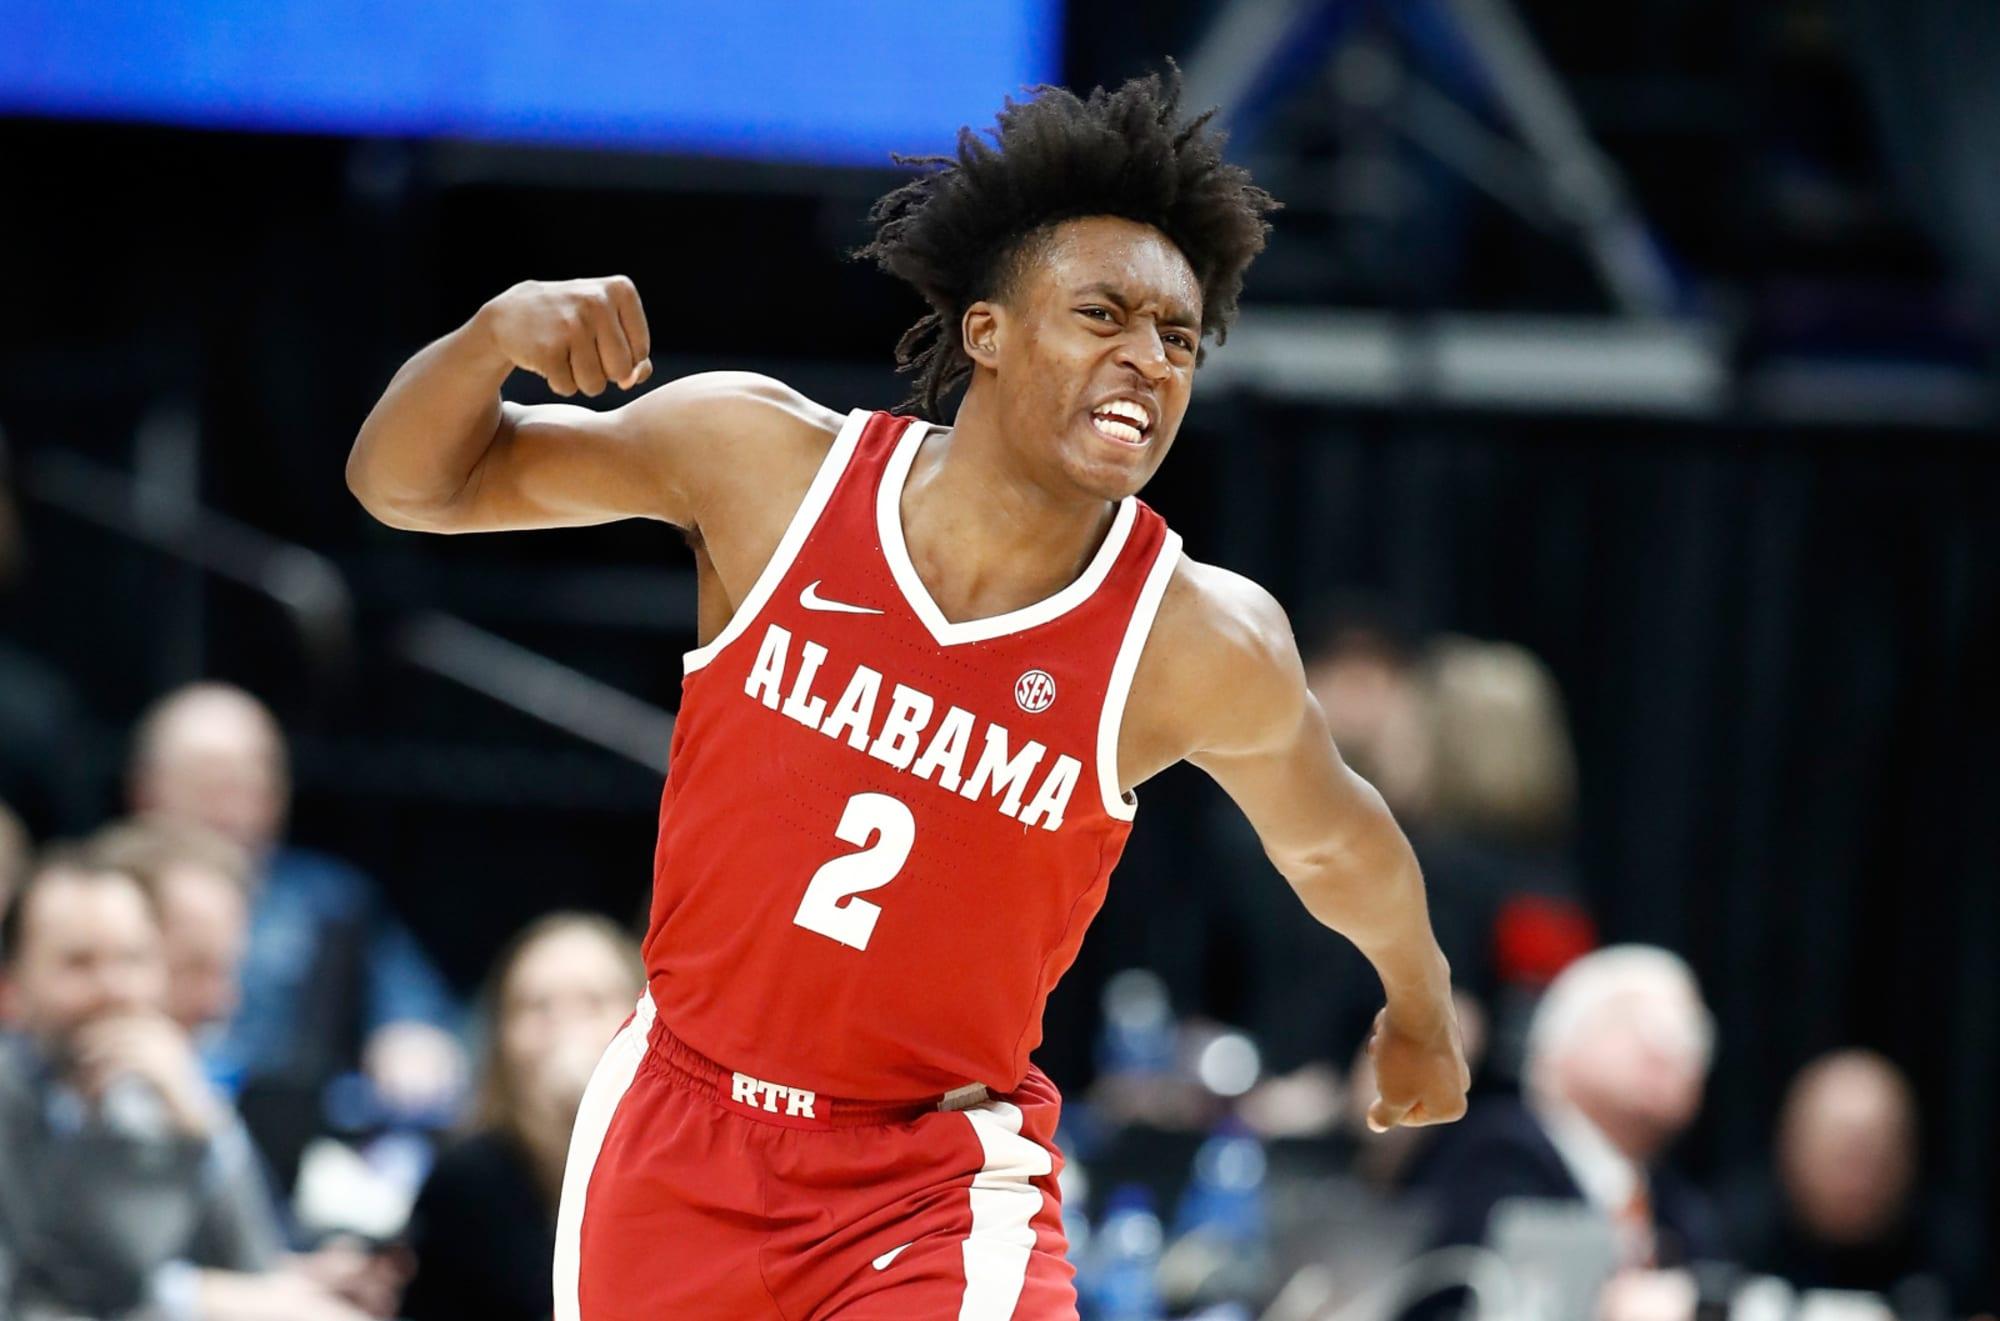 Alabama Basketball: 10 greatest Crimson Tide players since 2010 ...